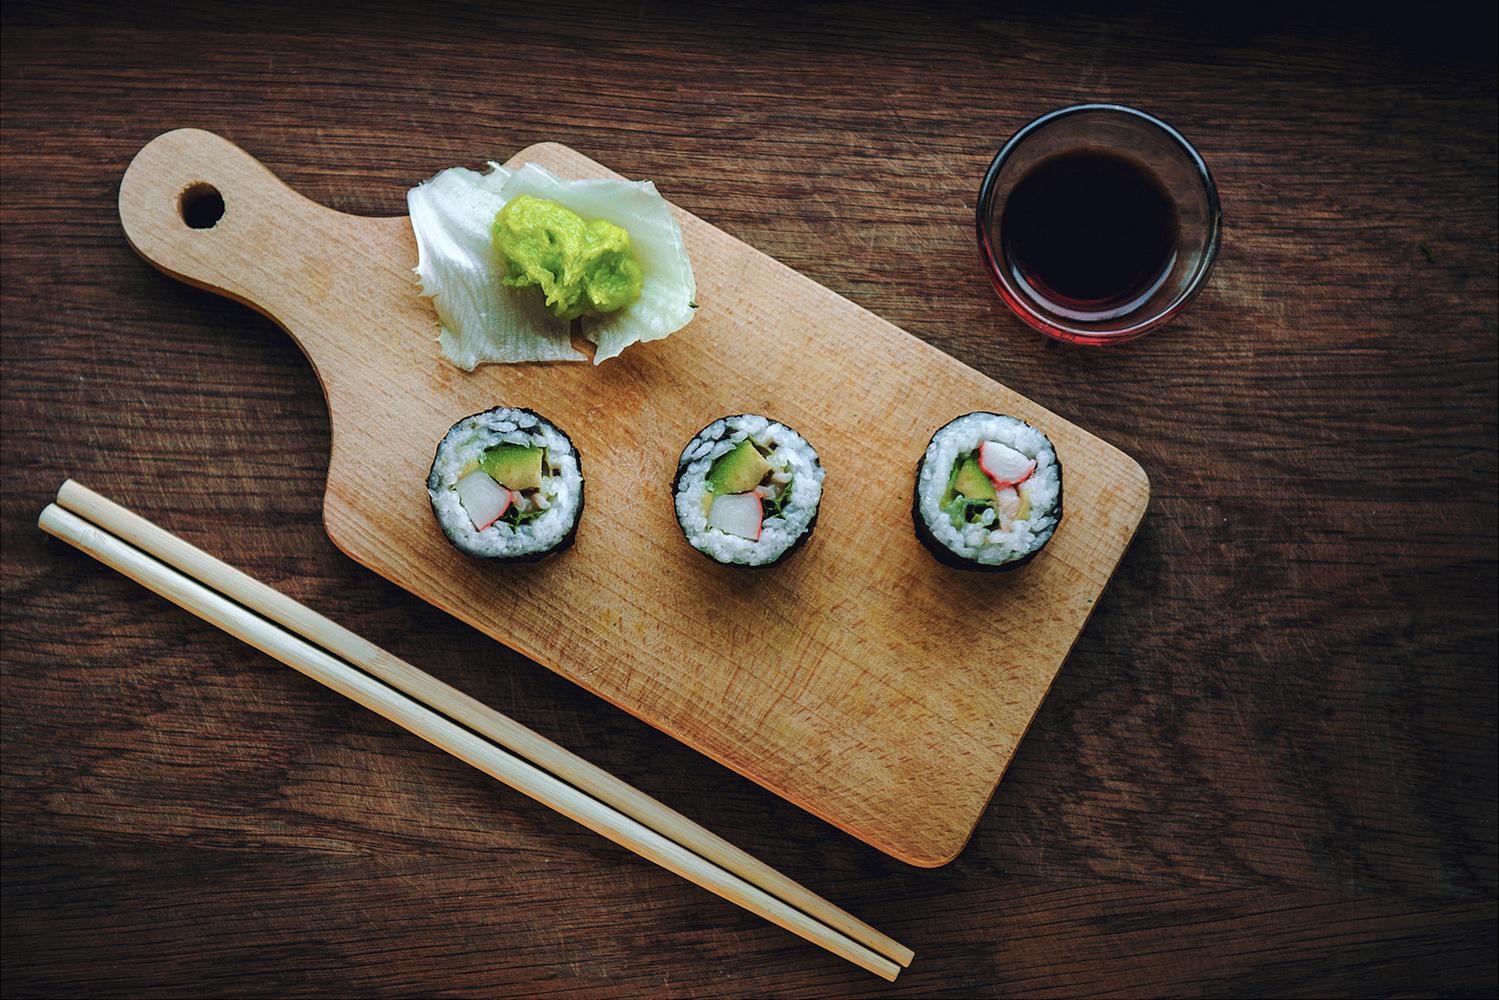 Sushi maki by Dariusz G